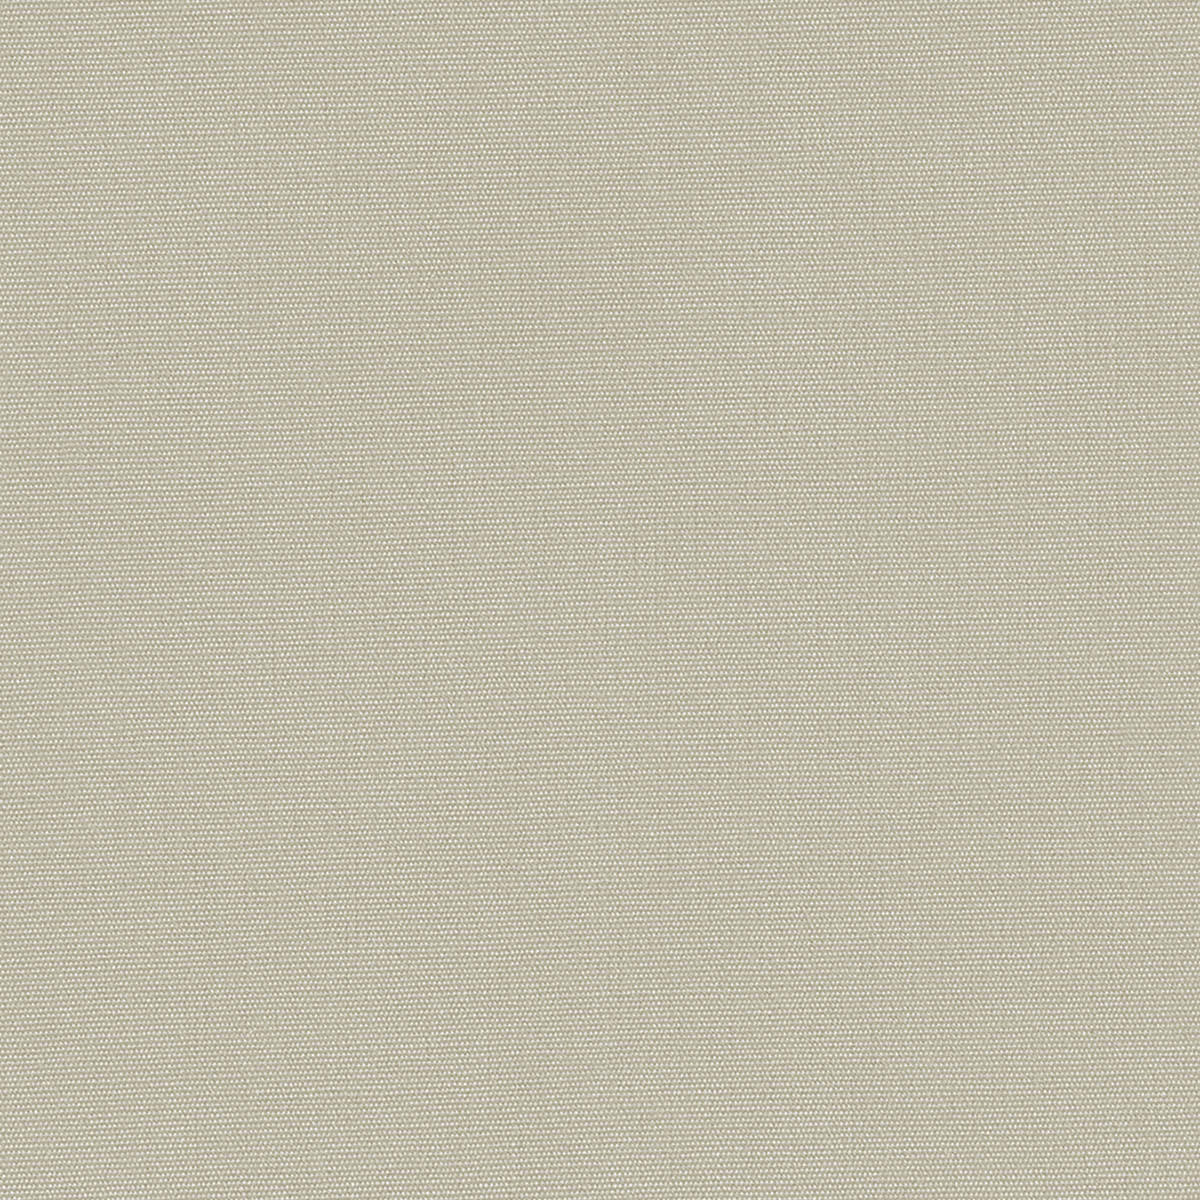 Tecido Lonita Inout Dralon® &Bull; - 3 &Bull; Deezign